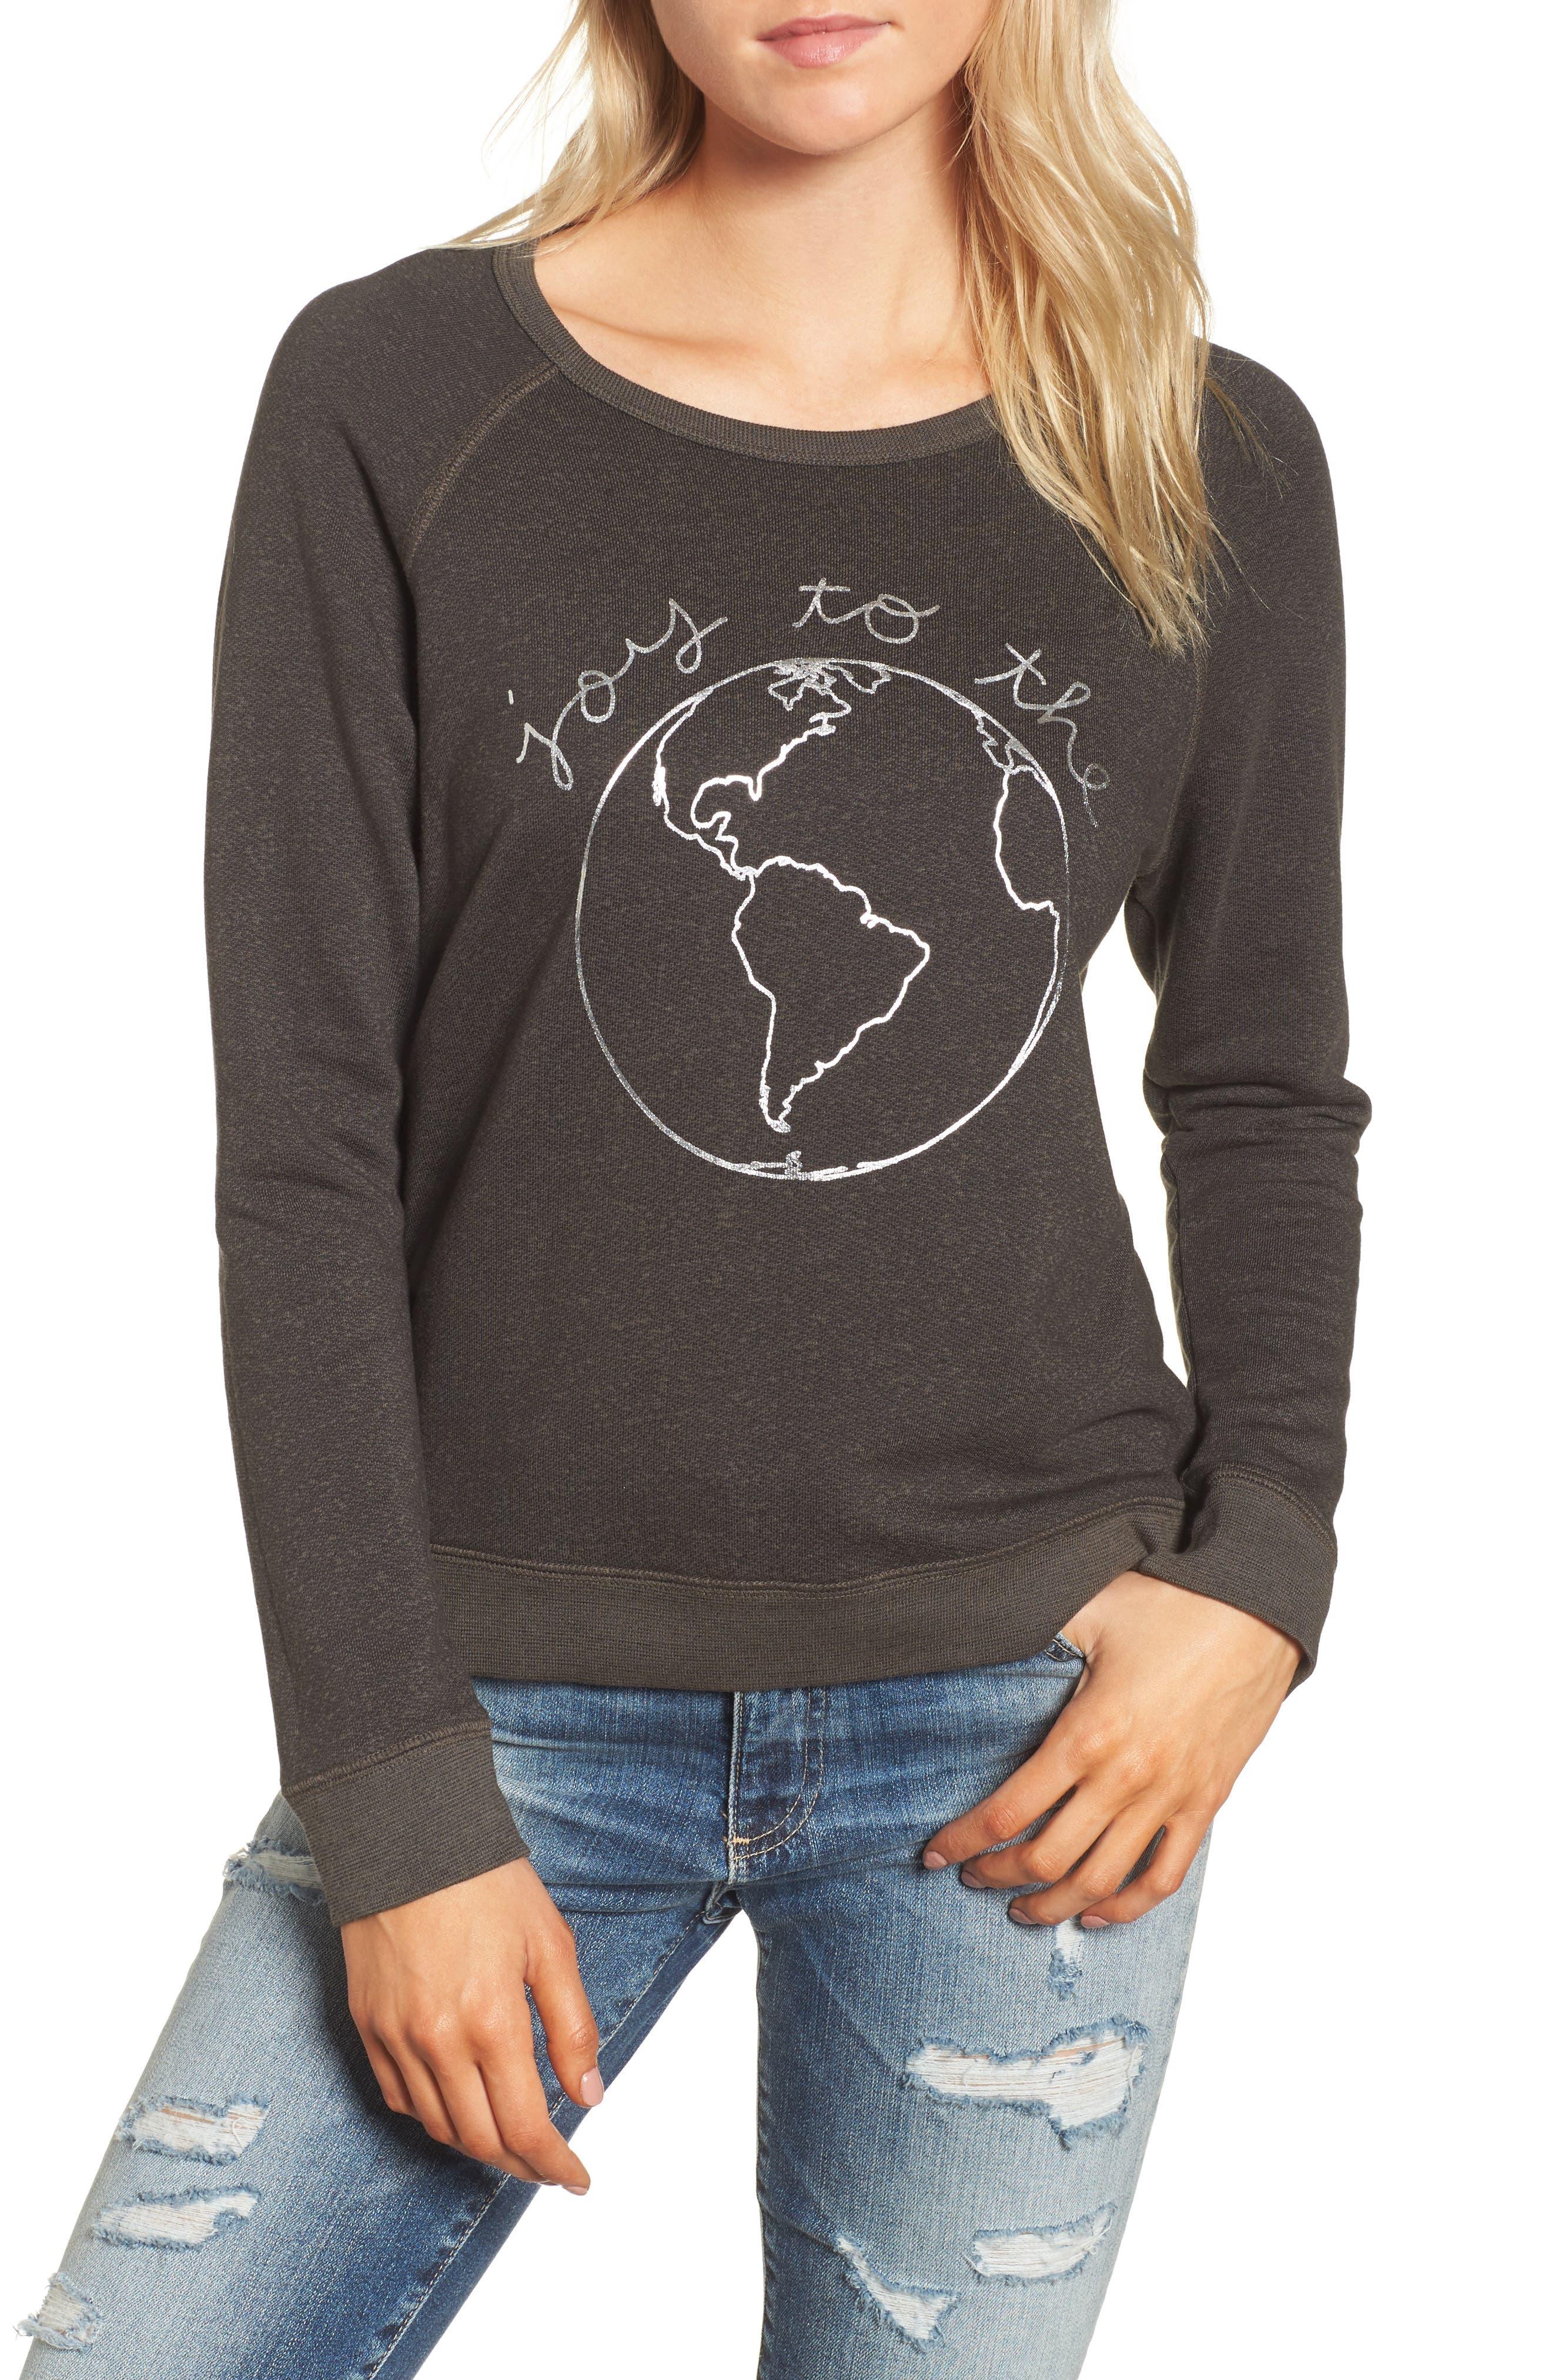 Joy to the World Sweatshirt,                             Main thumbnail 1, color,                             001